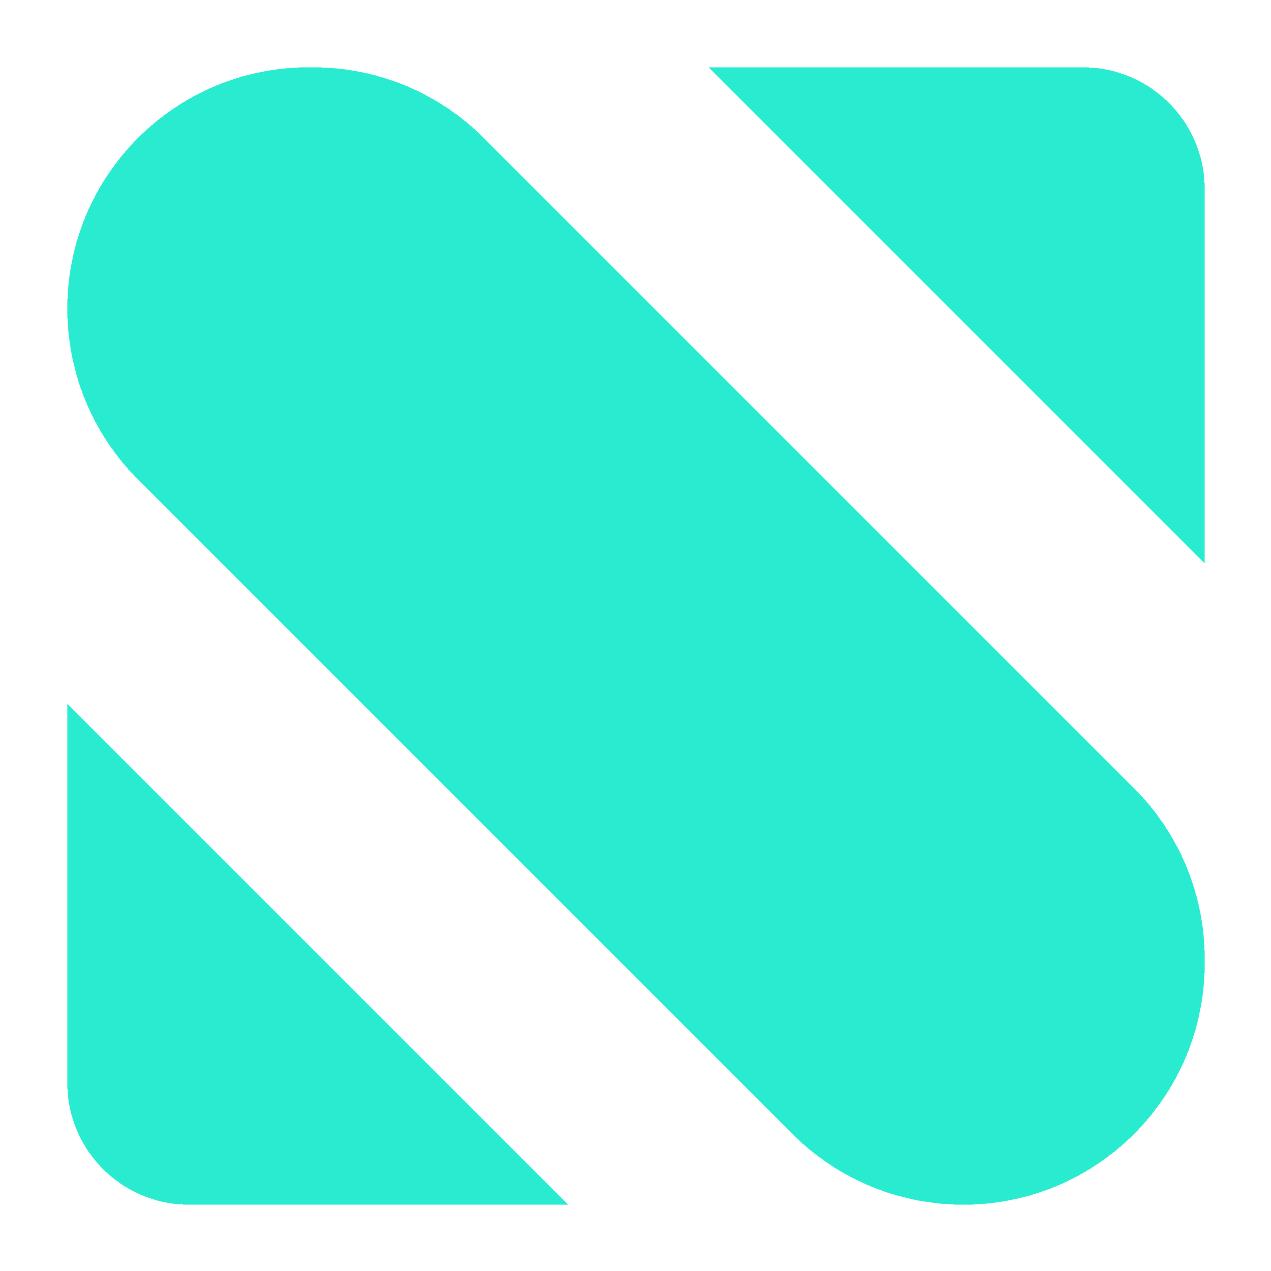 Scalable Capital's logo